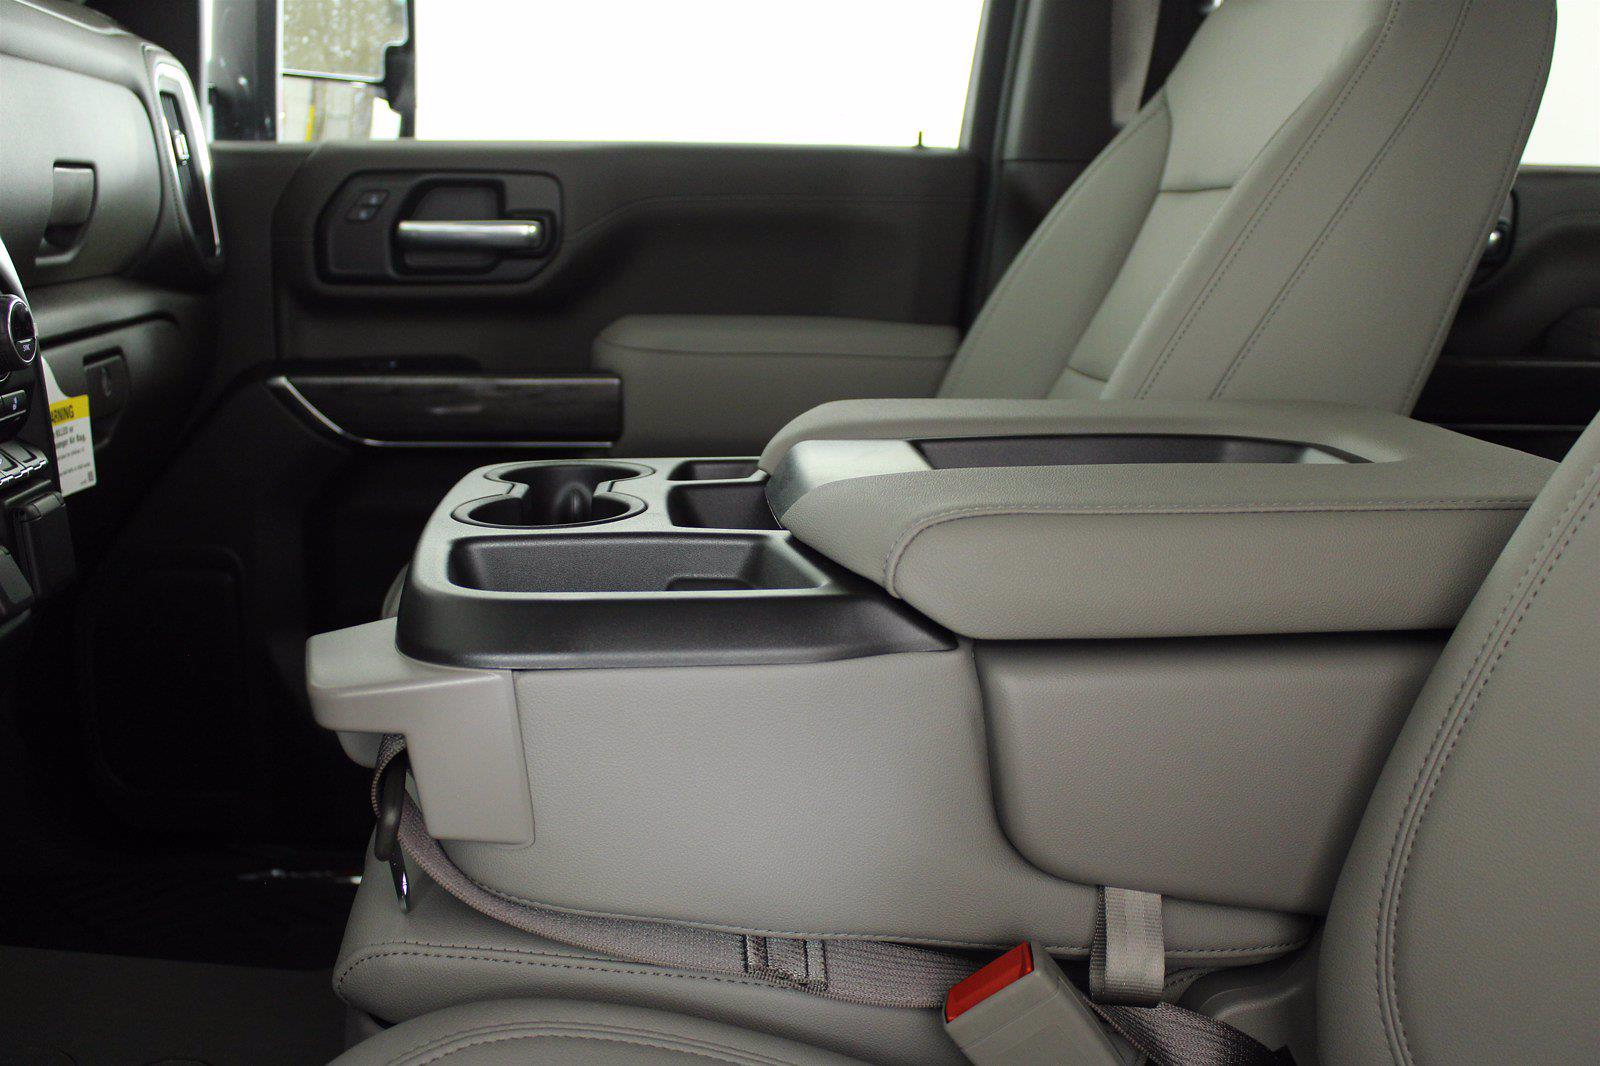 2021 Chevrolet Silverado 3500 Crew Cab 4x4, Pickup #D111089 - photo 13